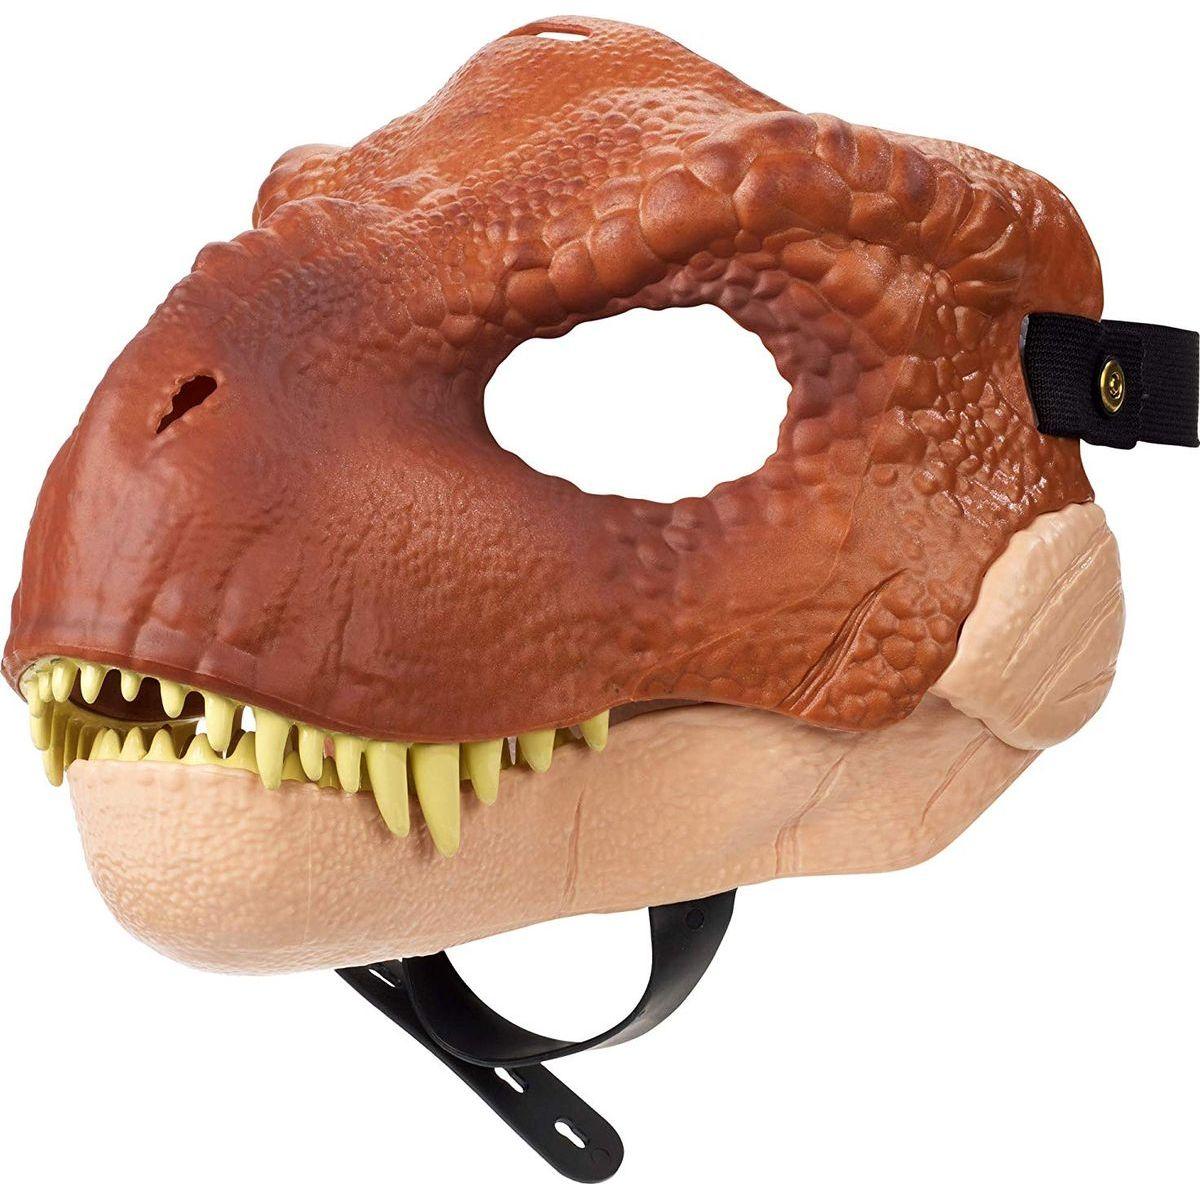 Mattel Jurský svět dino maska Tyrannosaurus Rex hnědý